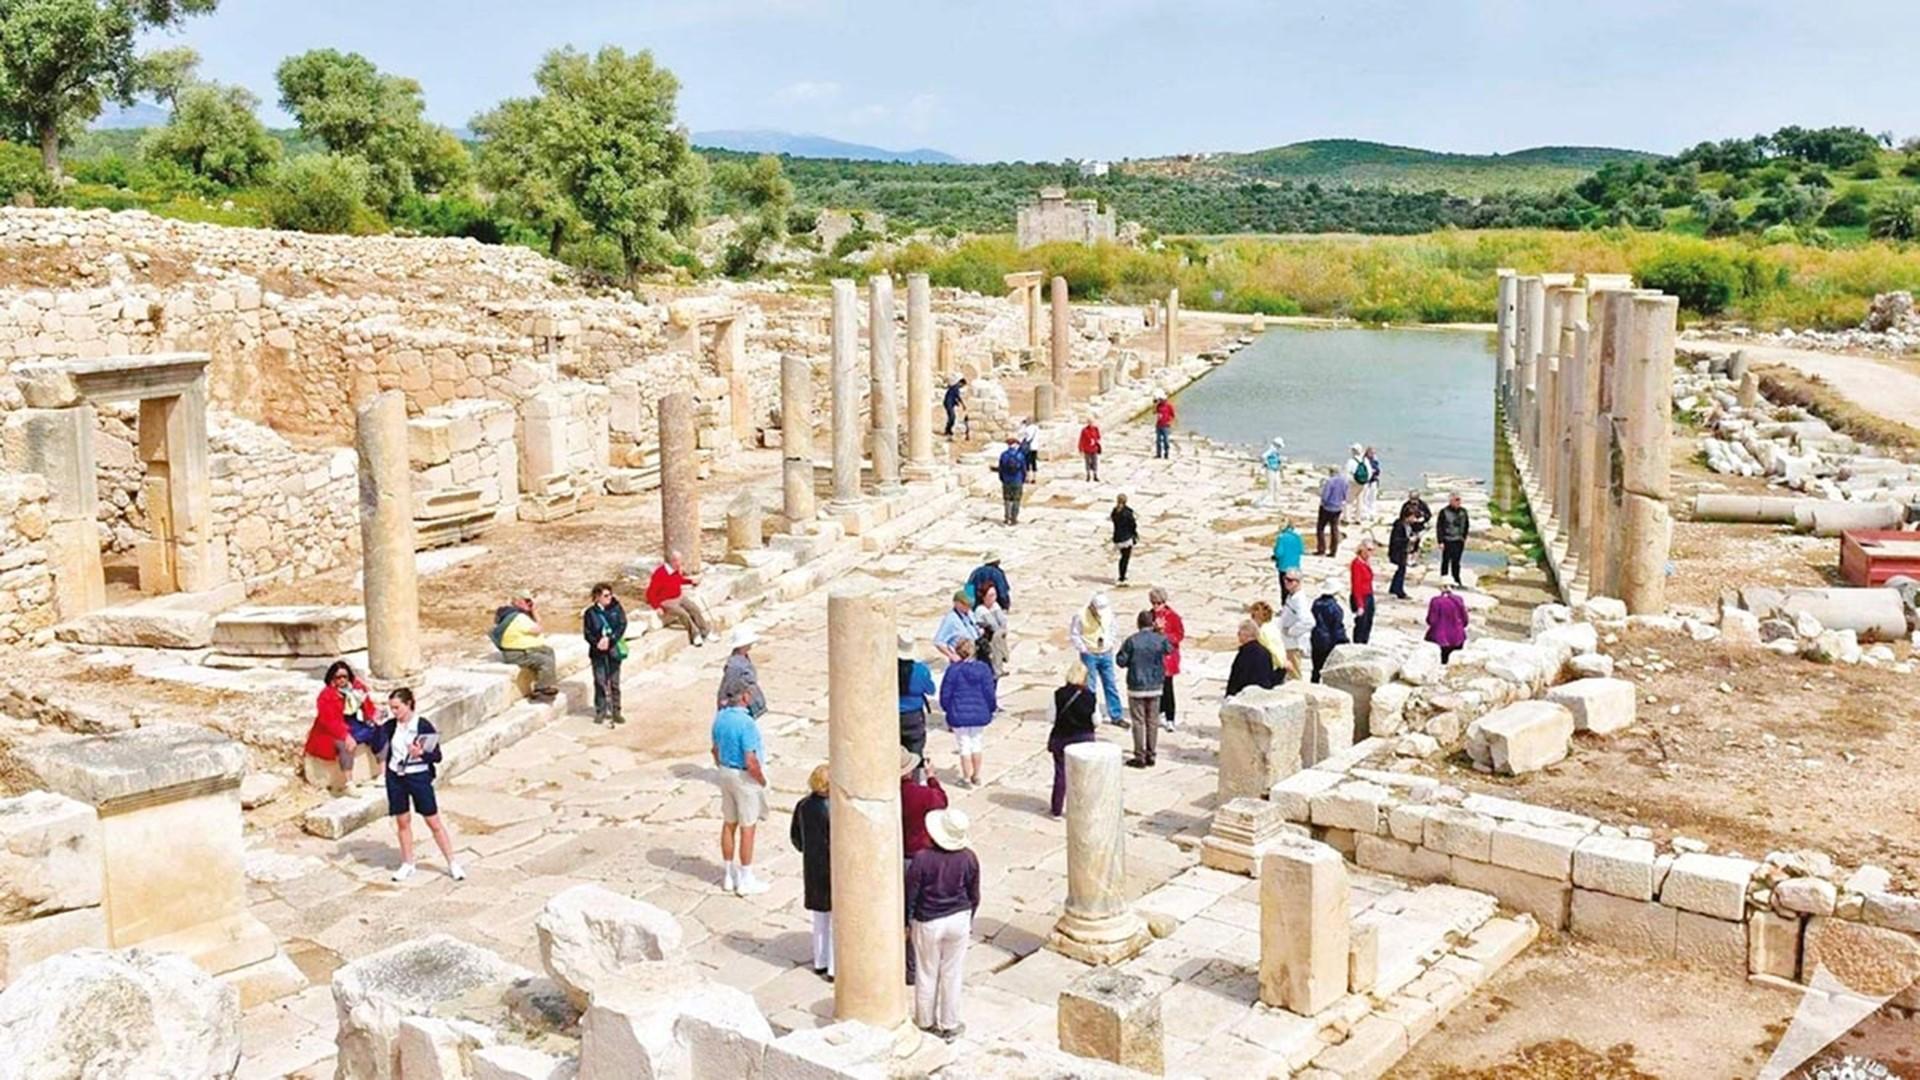 2020 AS THE YEAR OF PATARA ANCIENT CITY